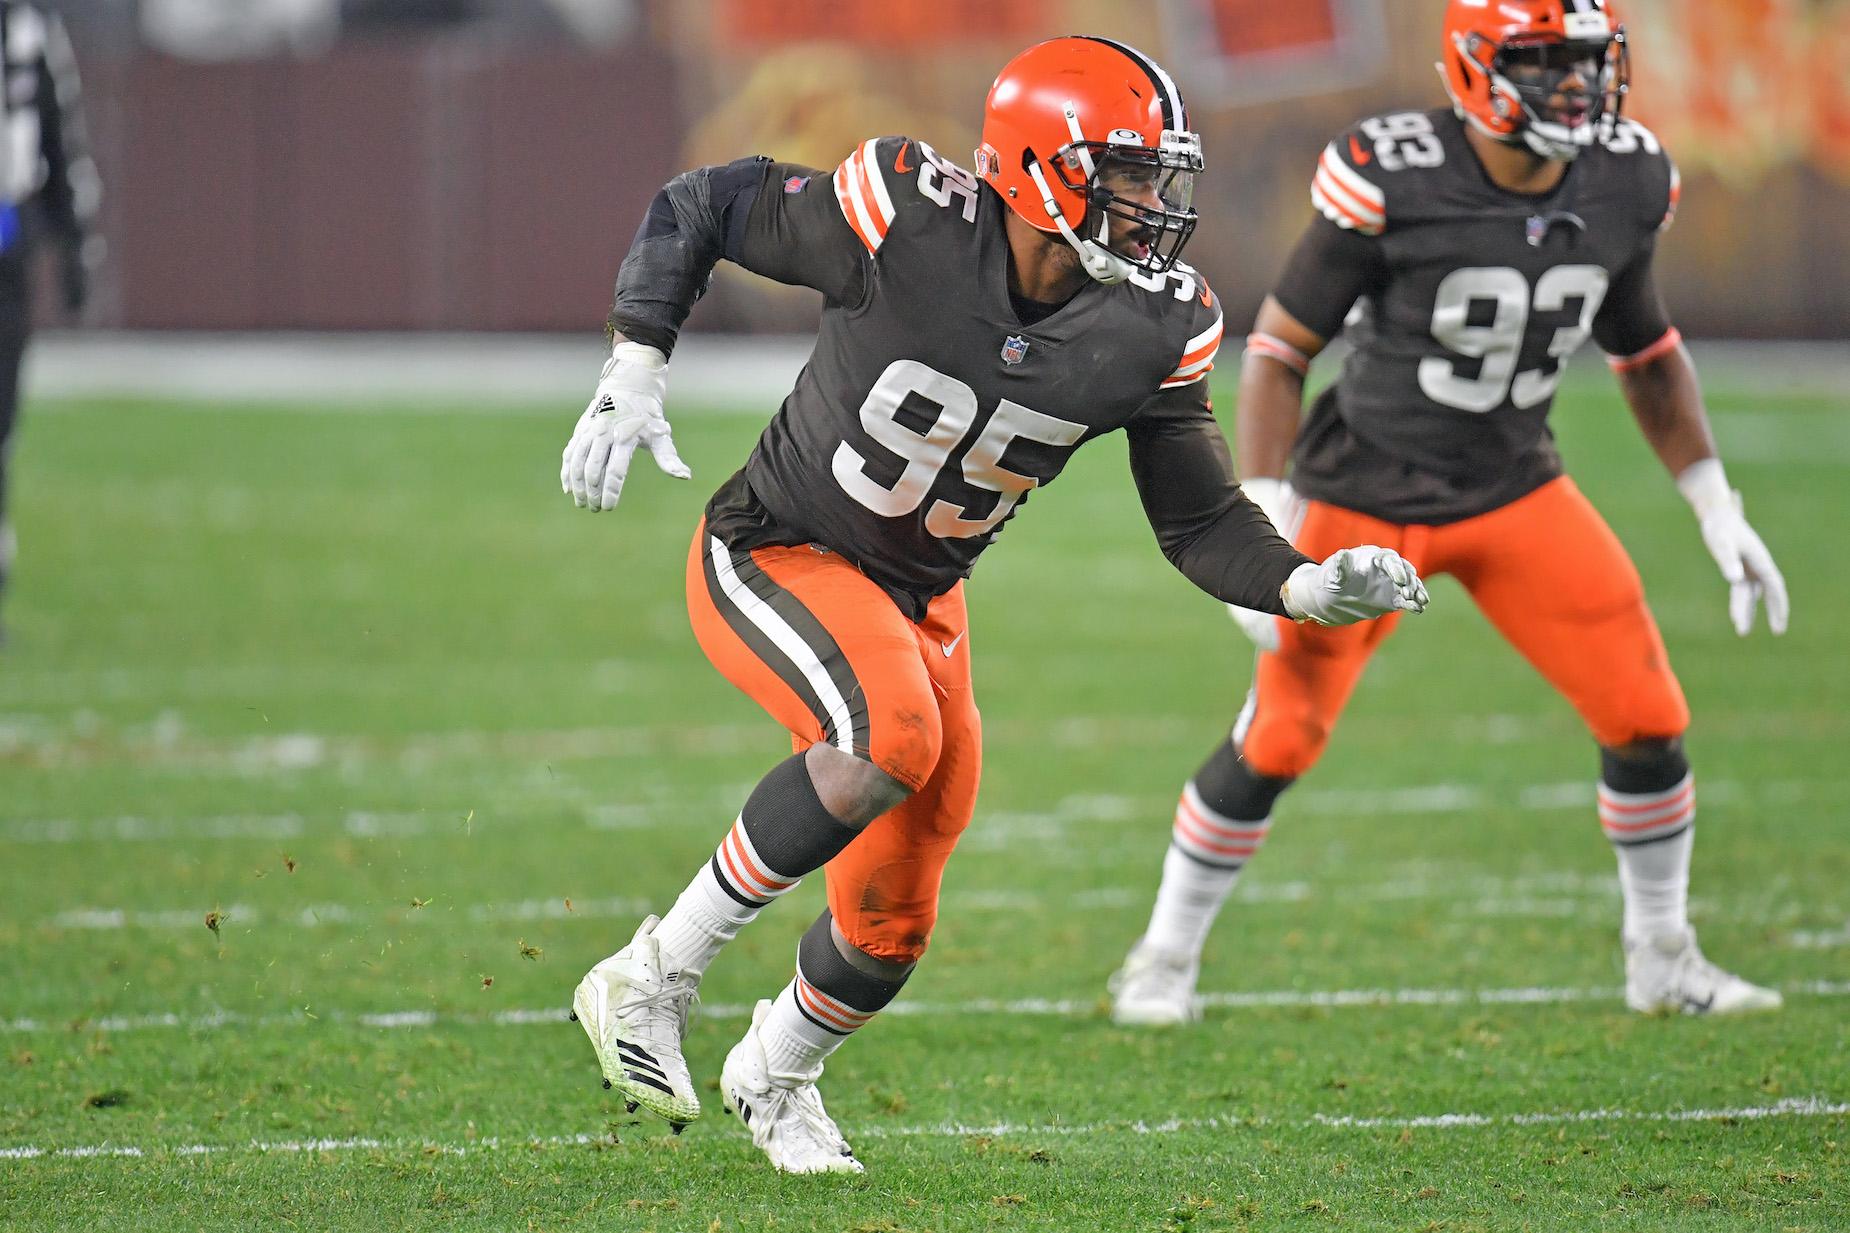 Browns defensive end Myles Garrett beat COVID-19, but still isn't back to 100%.  